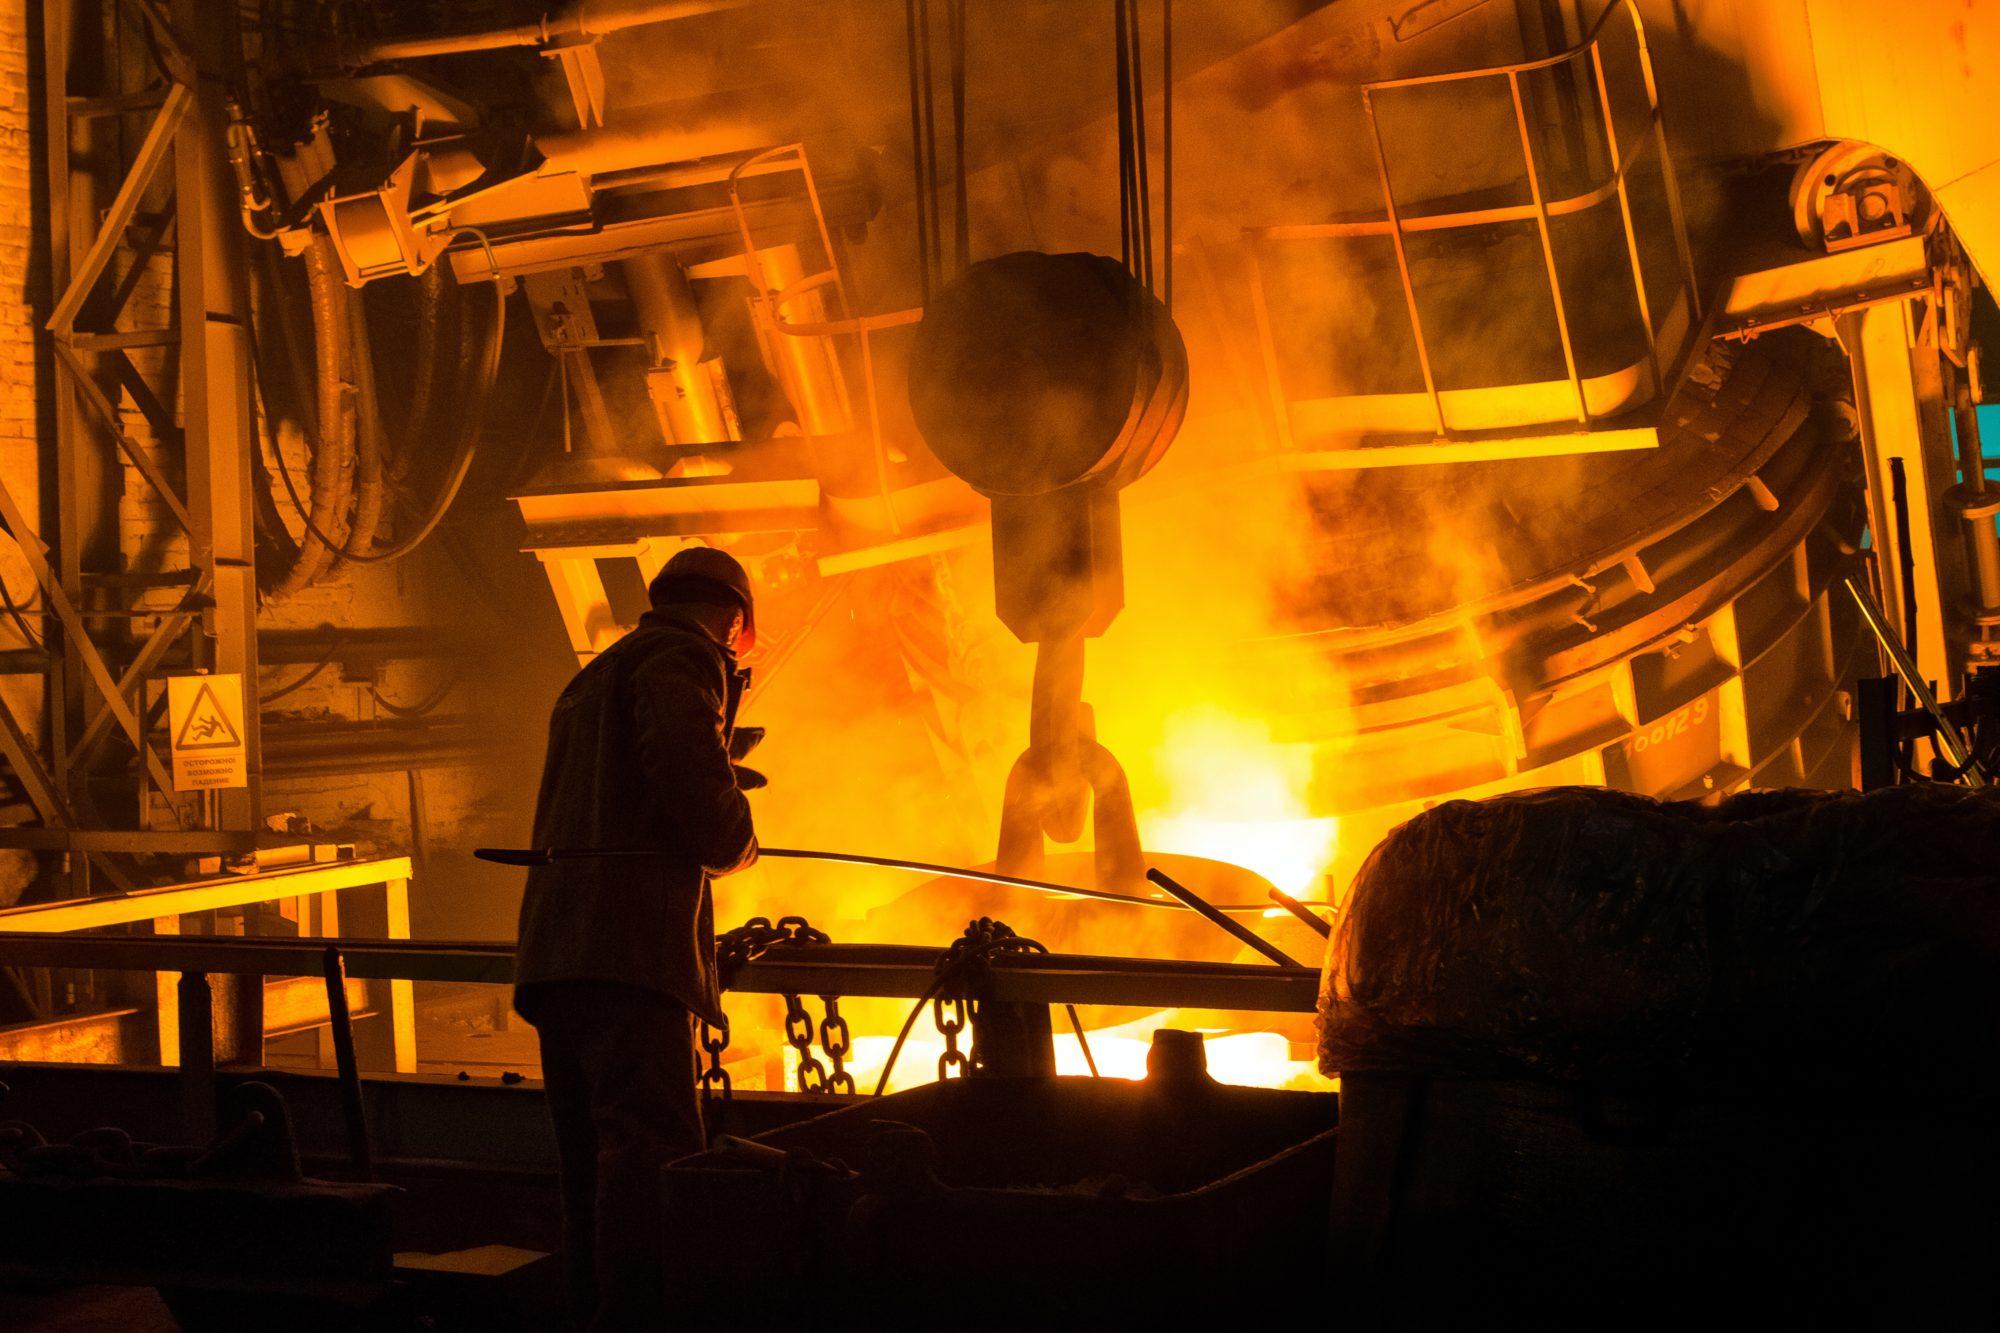 Metal refinery